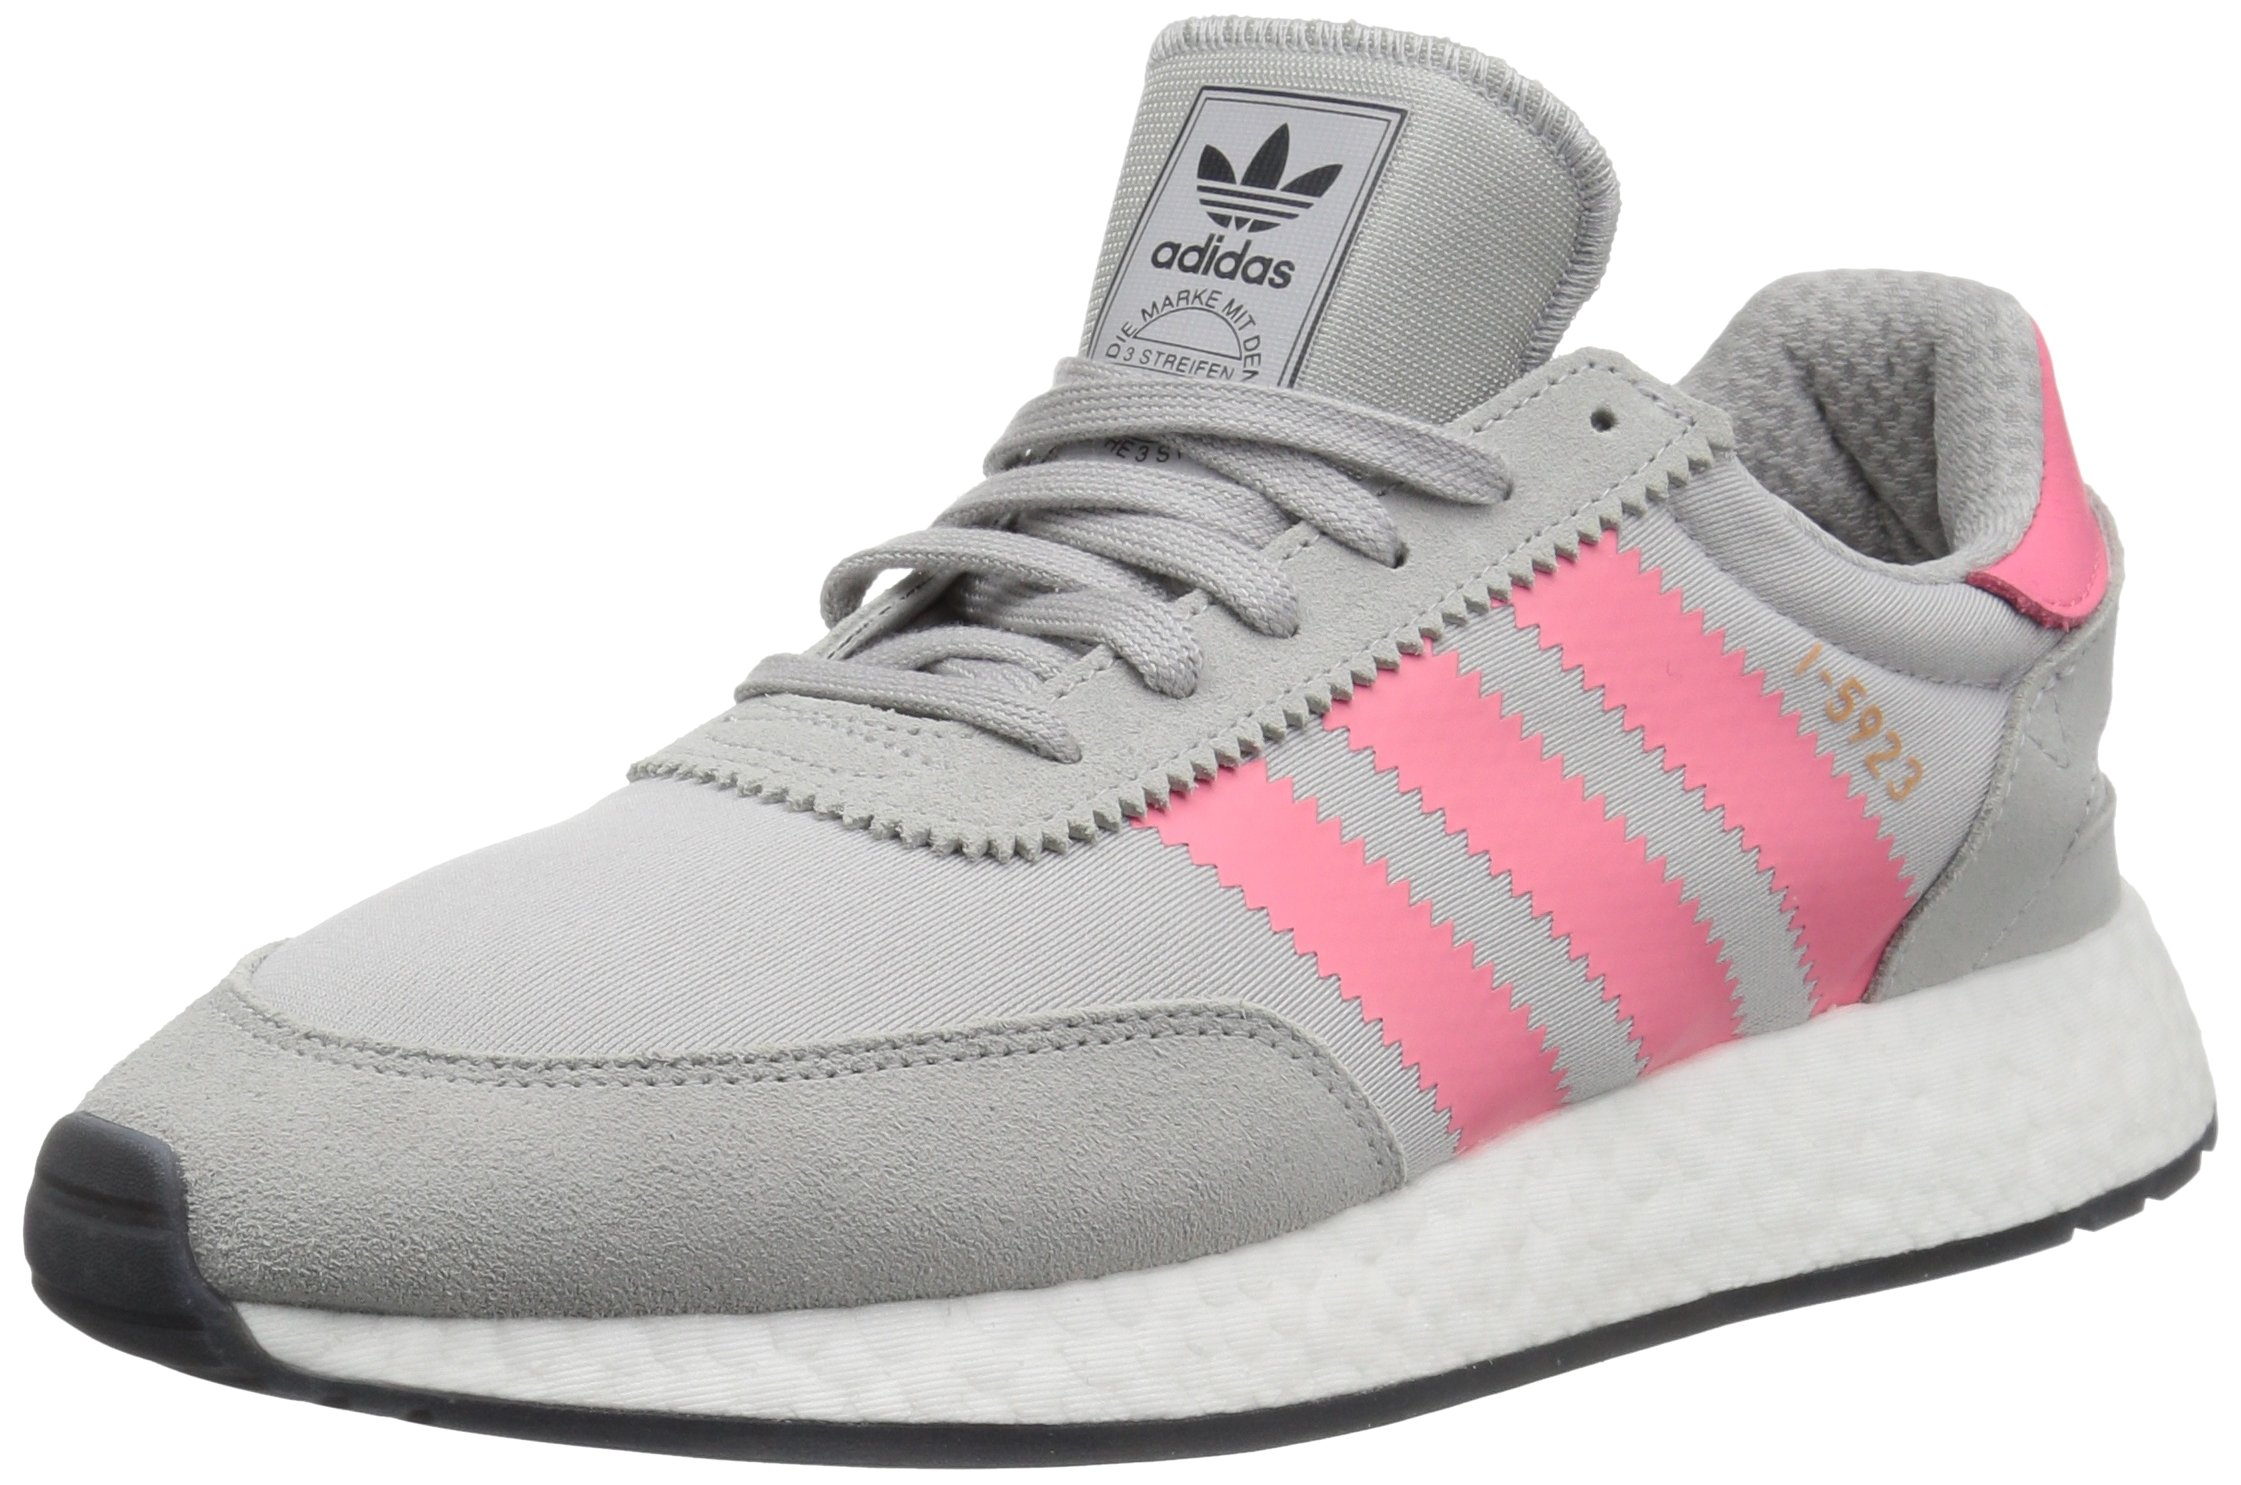 4bb553ed29bae adidas Originals Women's I-5923 Running Shoe, Grey/Chalk Pink/Black, 11 M US